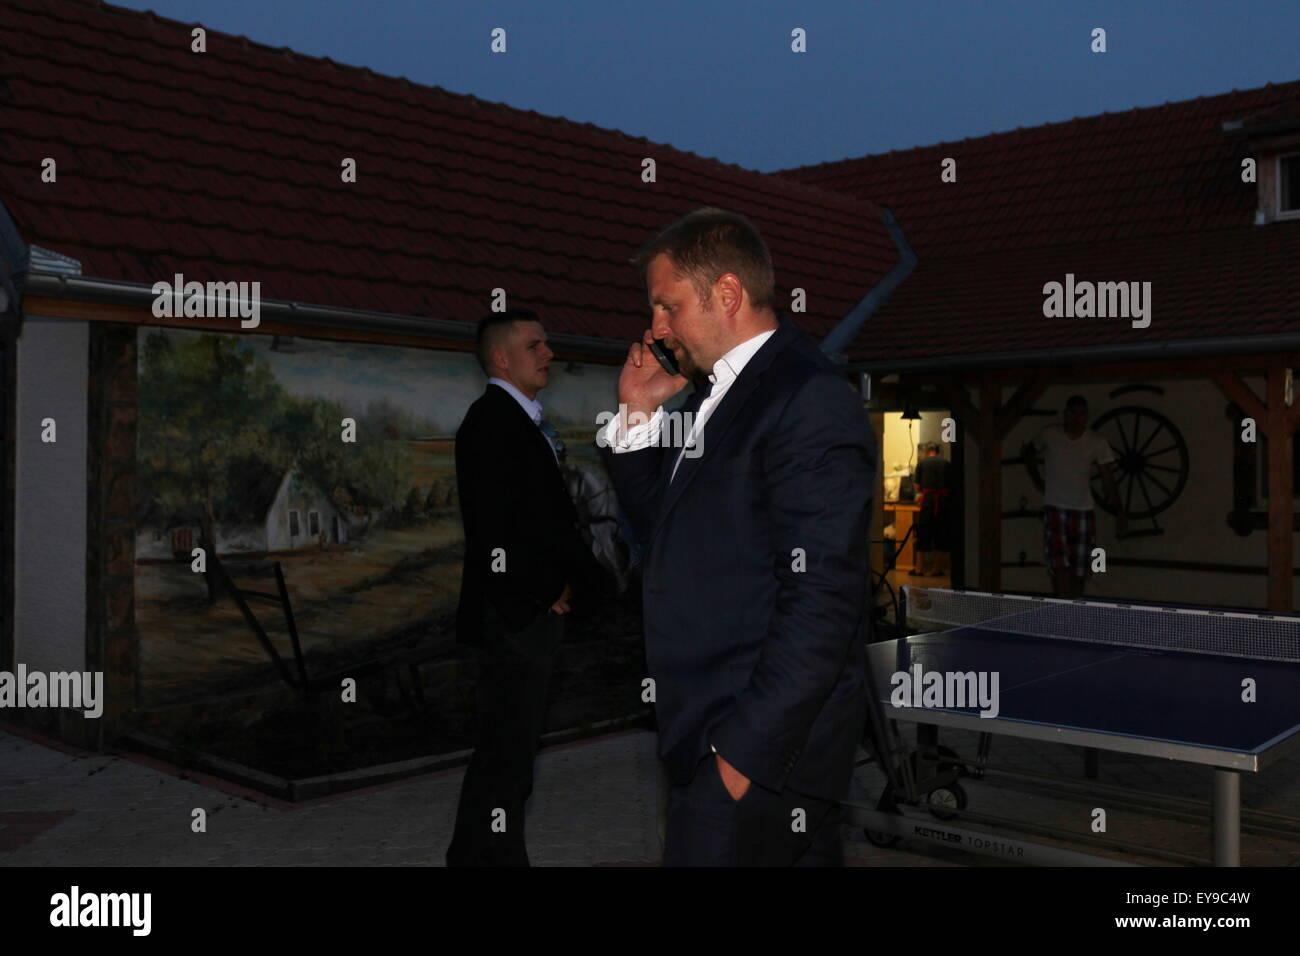 Liberland president Vit Jedlicka - Stock Image